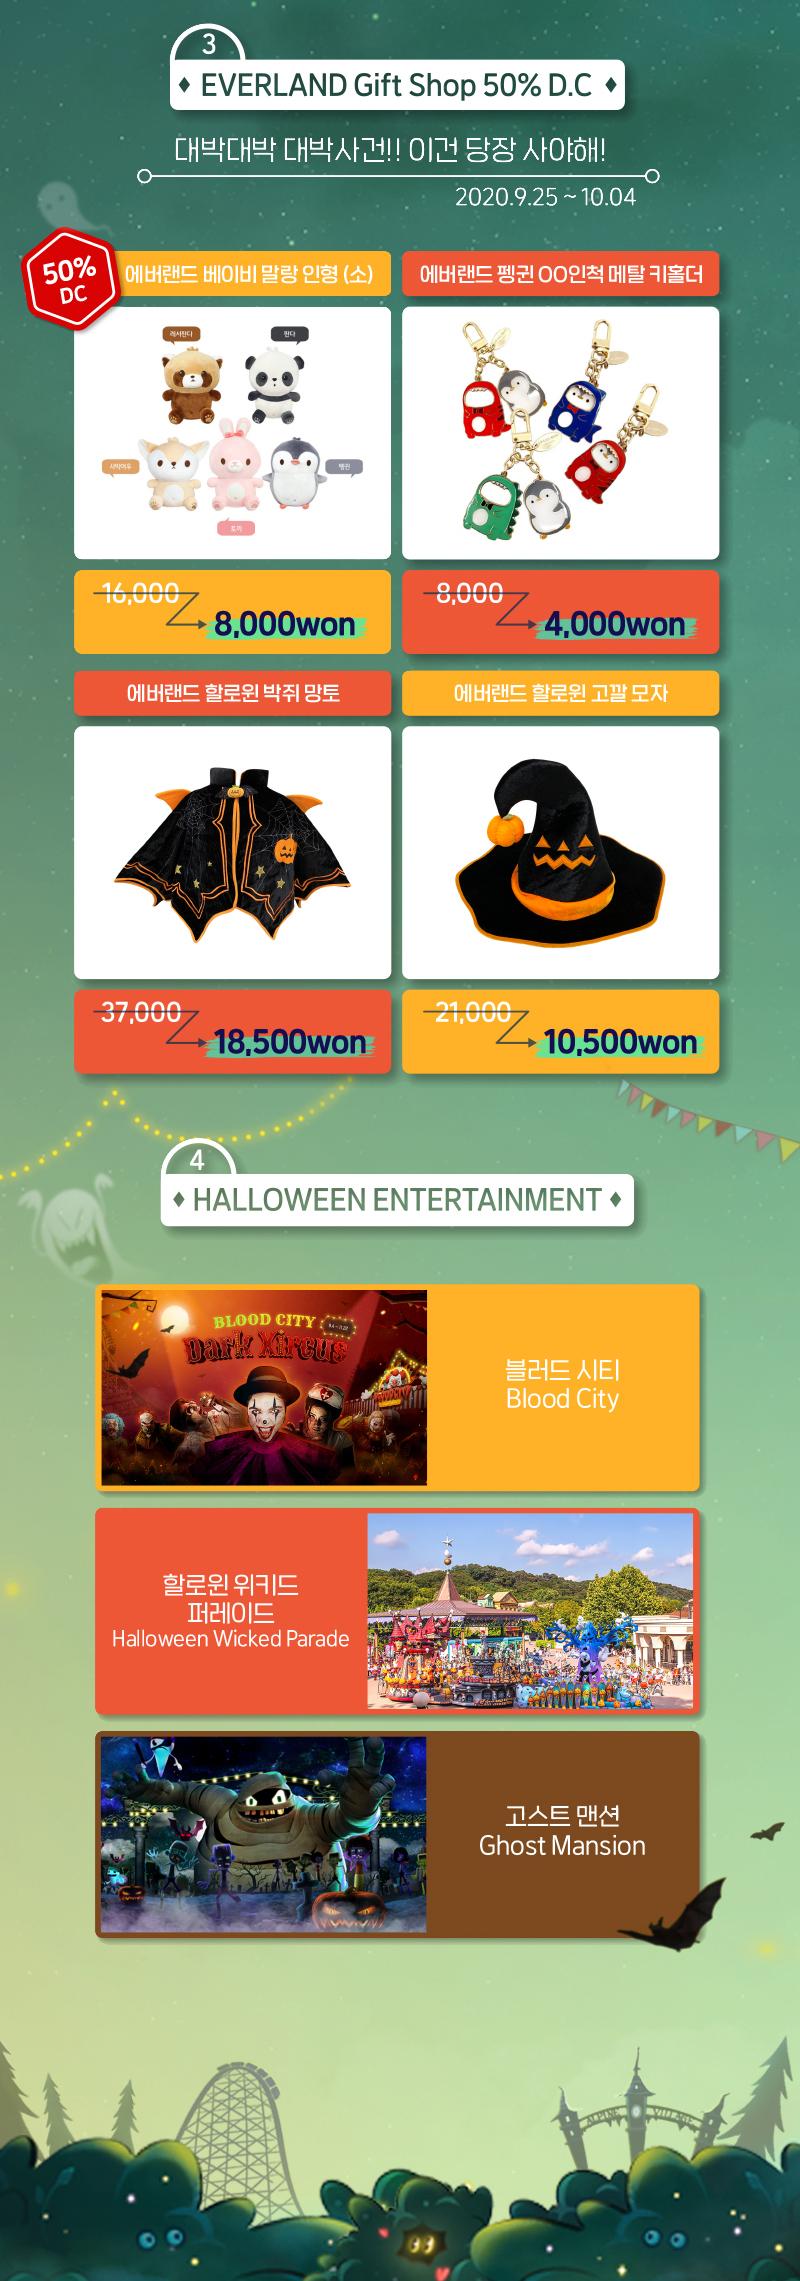 2020 everland happy halloween6